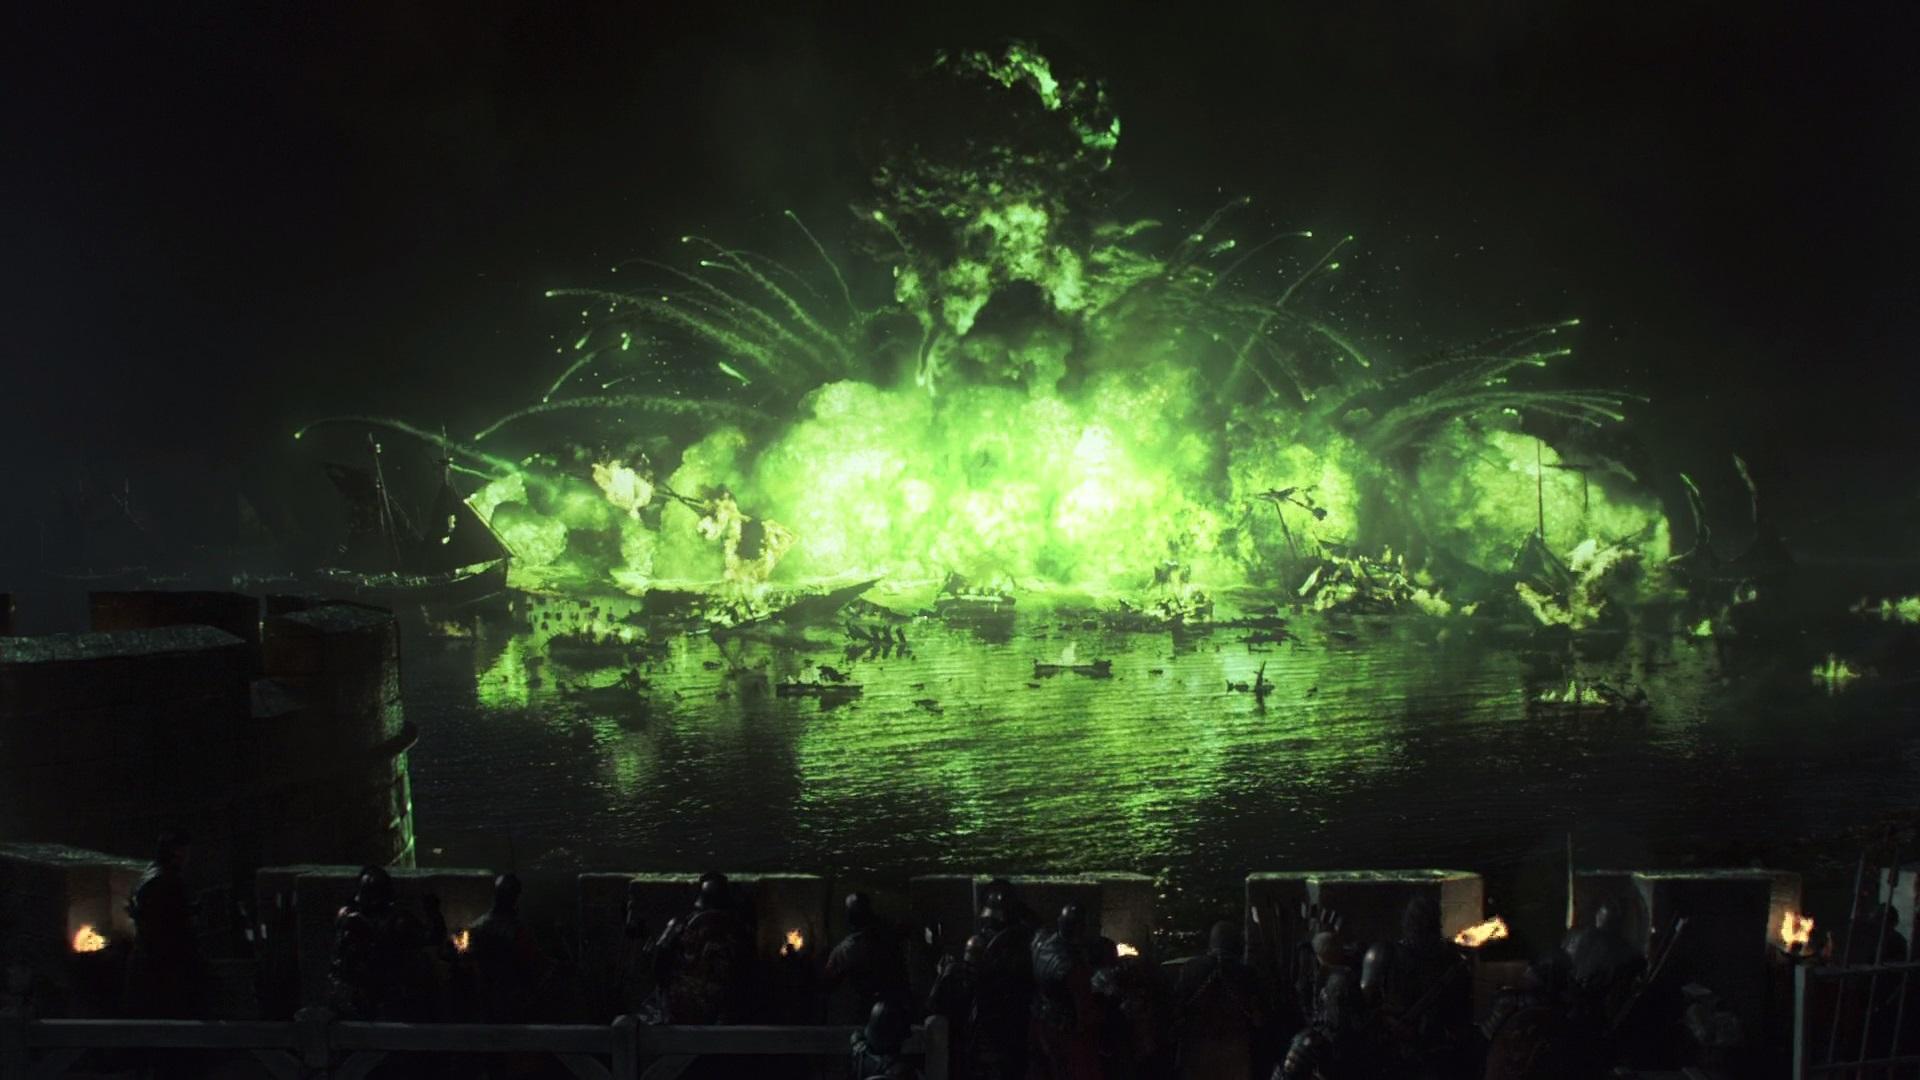 Resultado de imagem para game of thrones episode 9 season 2